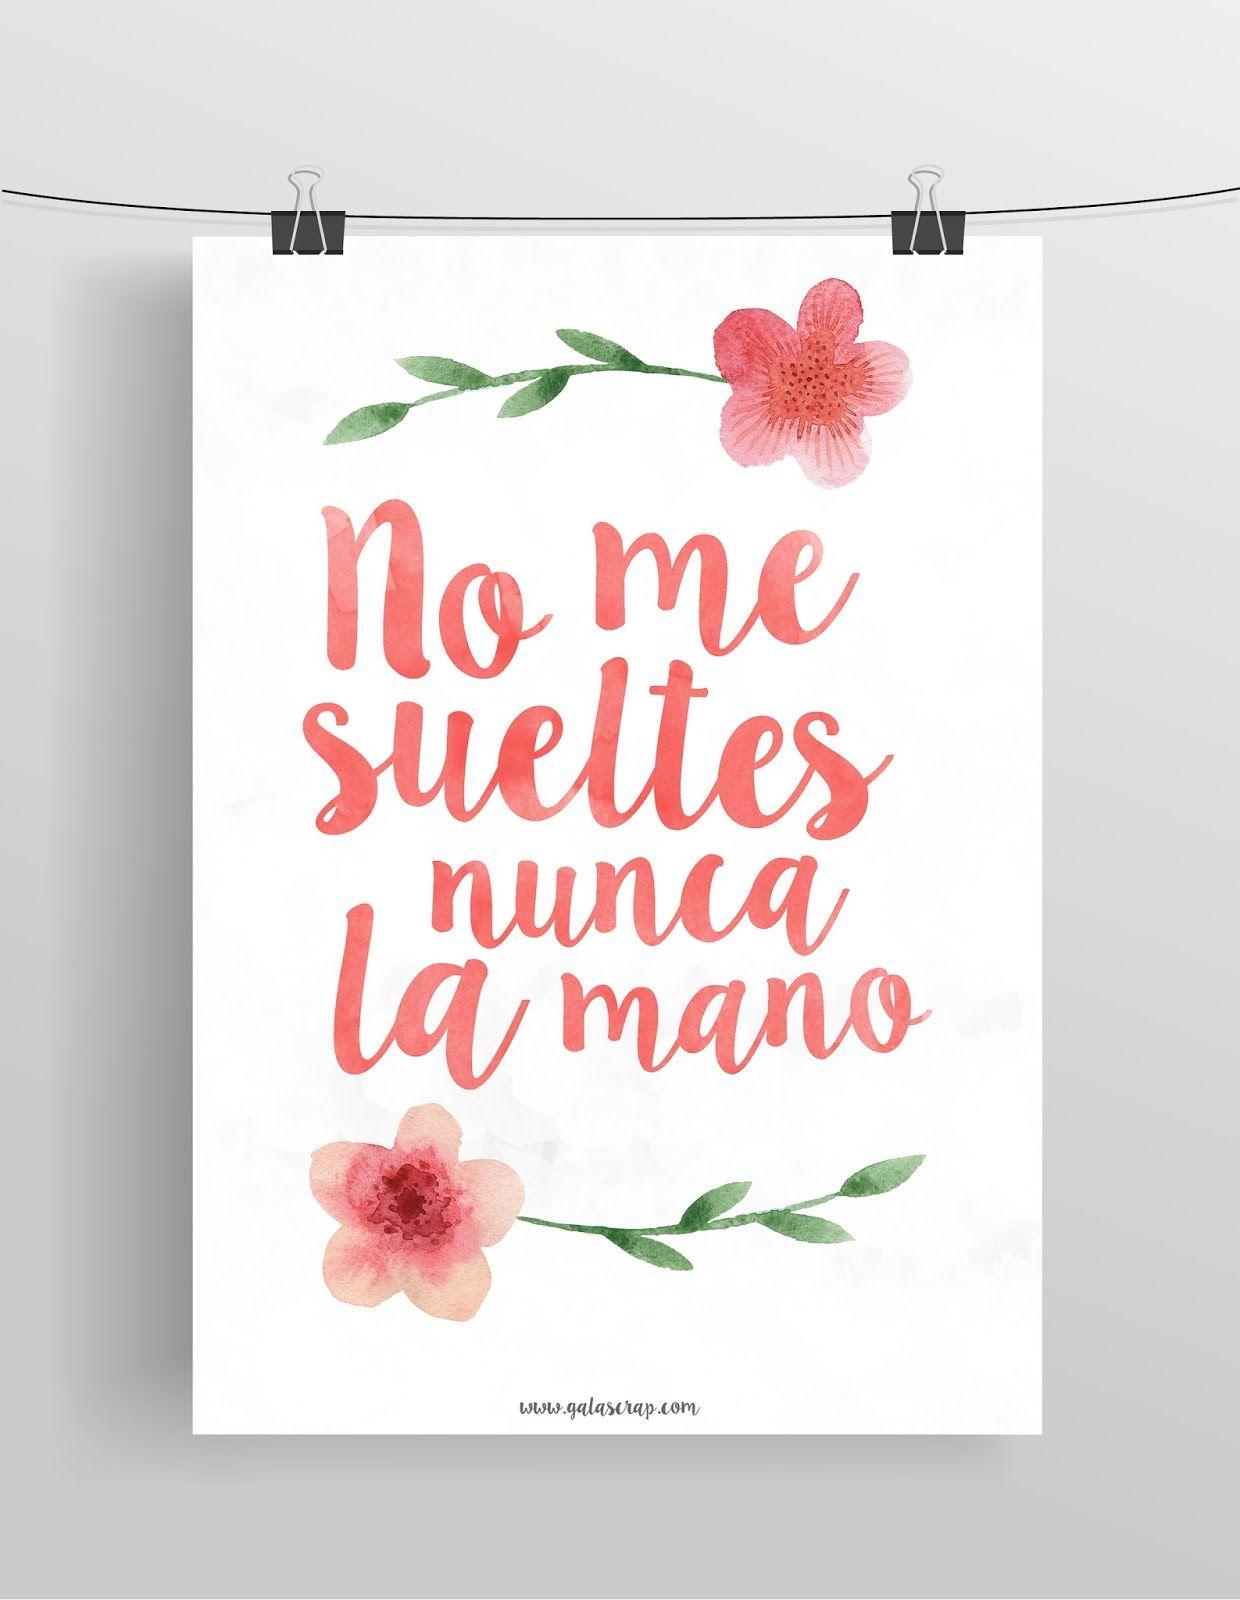 Dia De La Madre Te Amo Pinterest La Madre Madres Y Frases